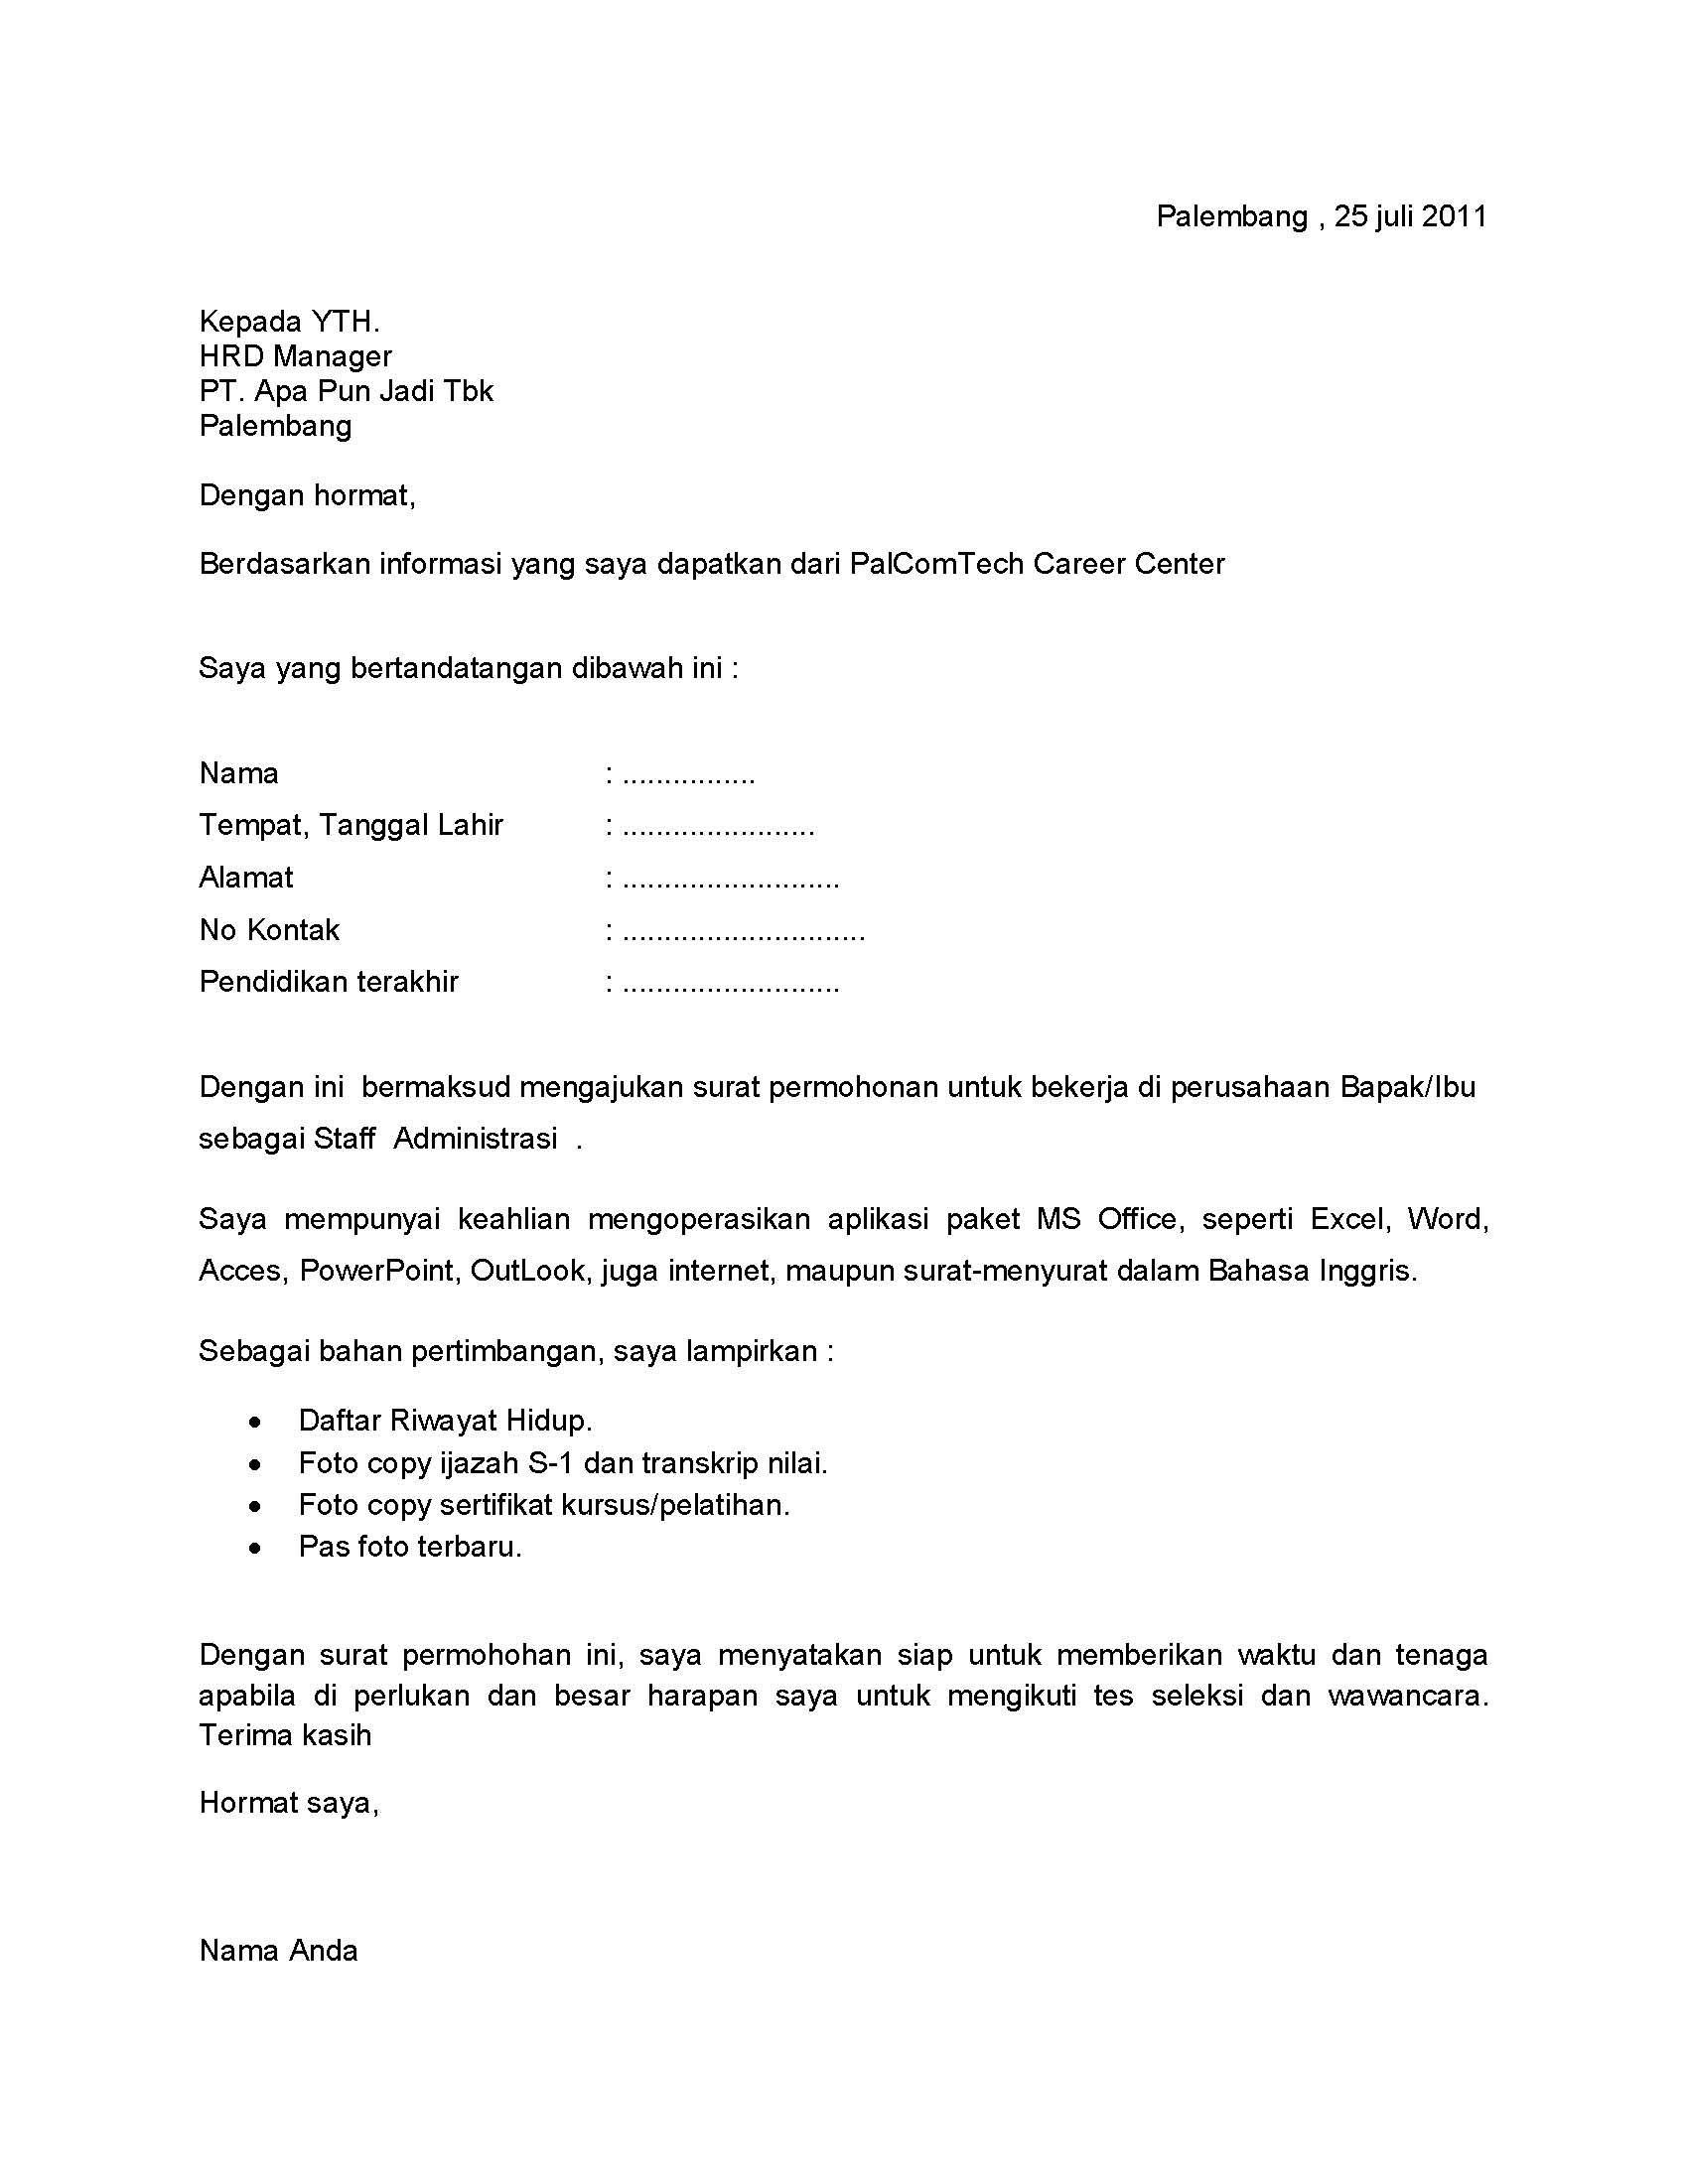 Contoh Surat Lamaran Kerja Bank 9 Jambi Surat Tulisan Tulisan Tangan